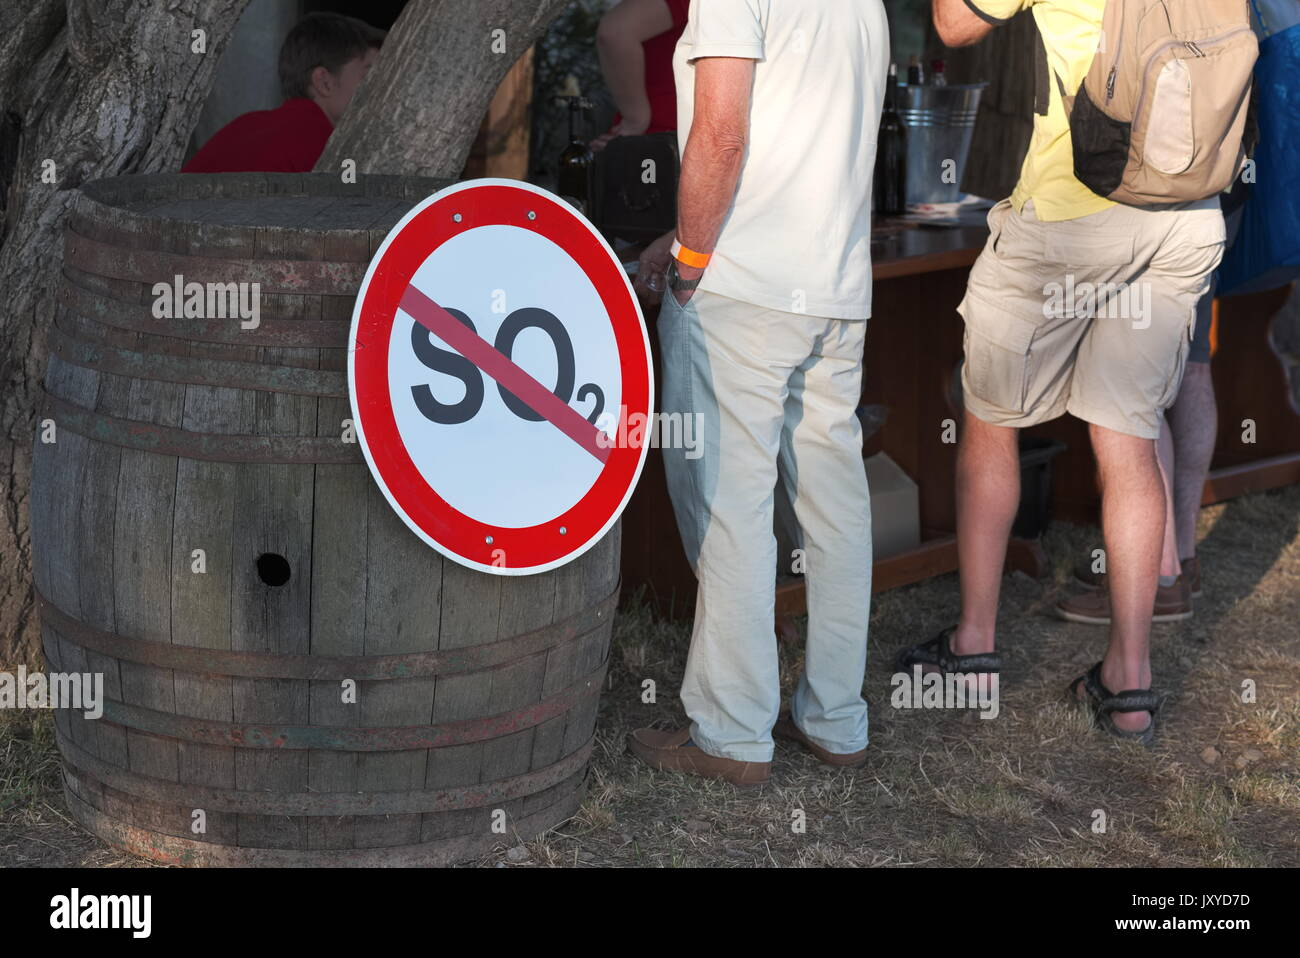 Sulfur Dioxide Prohibition Sign on a Big Barrel at Wine Festival - Stock Image